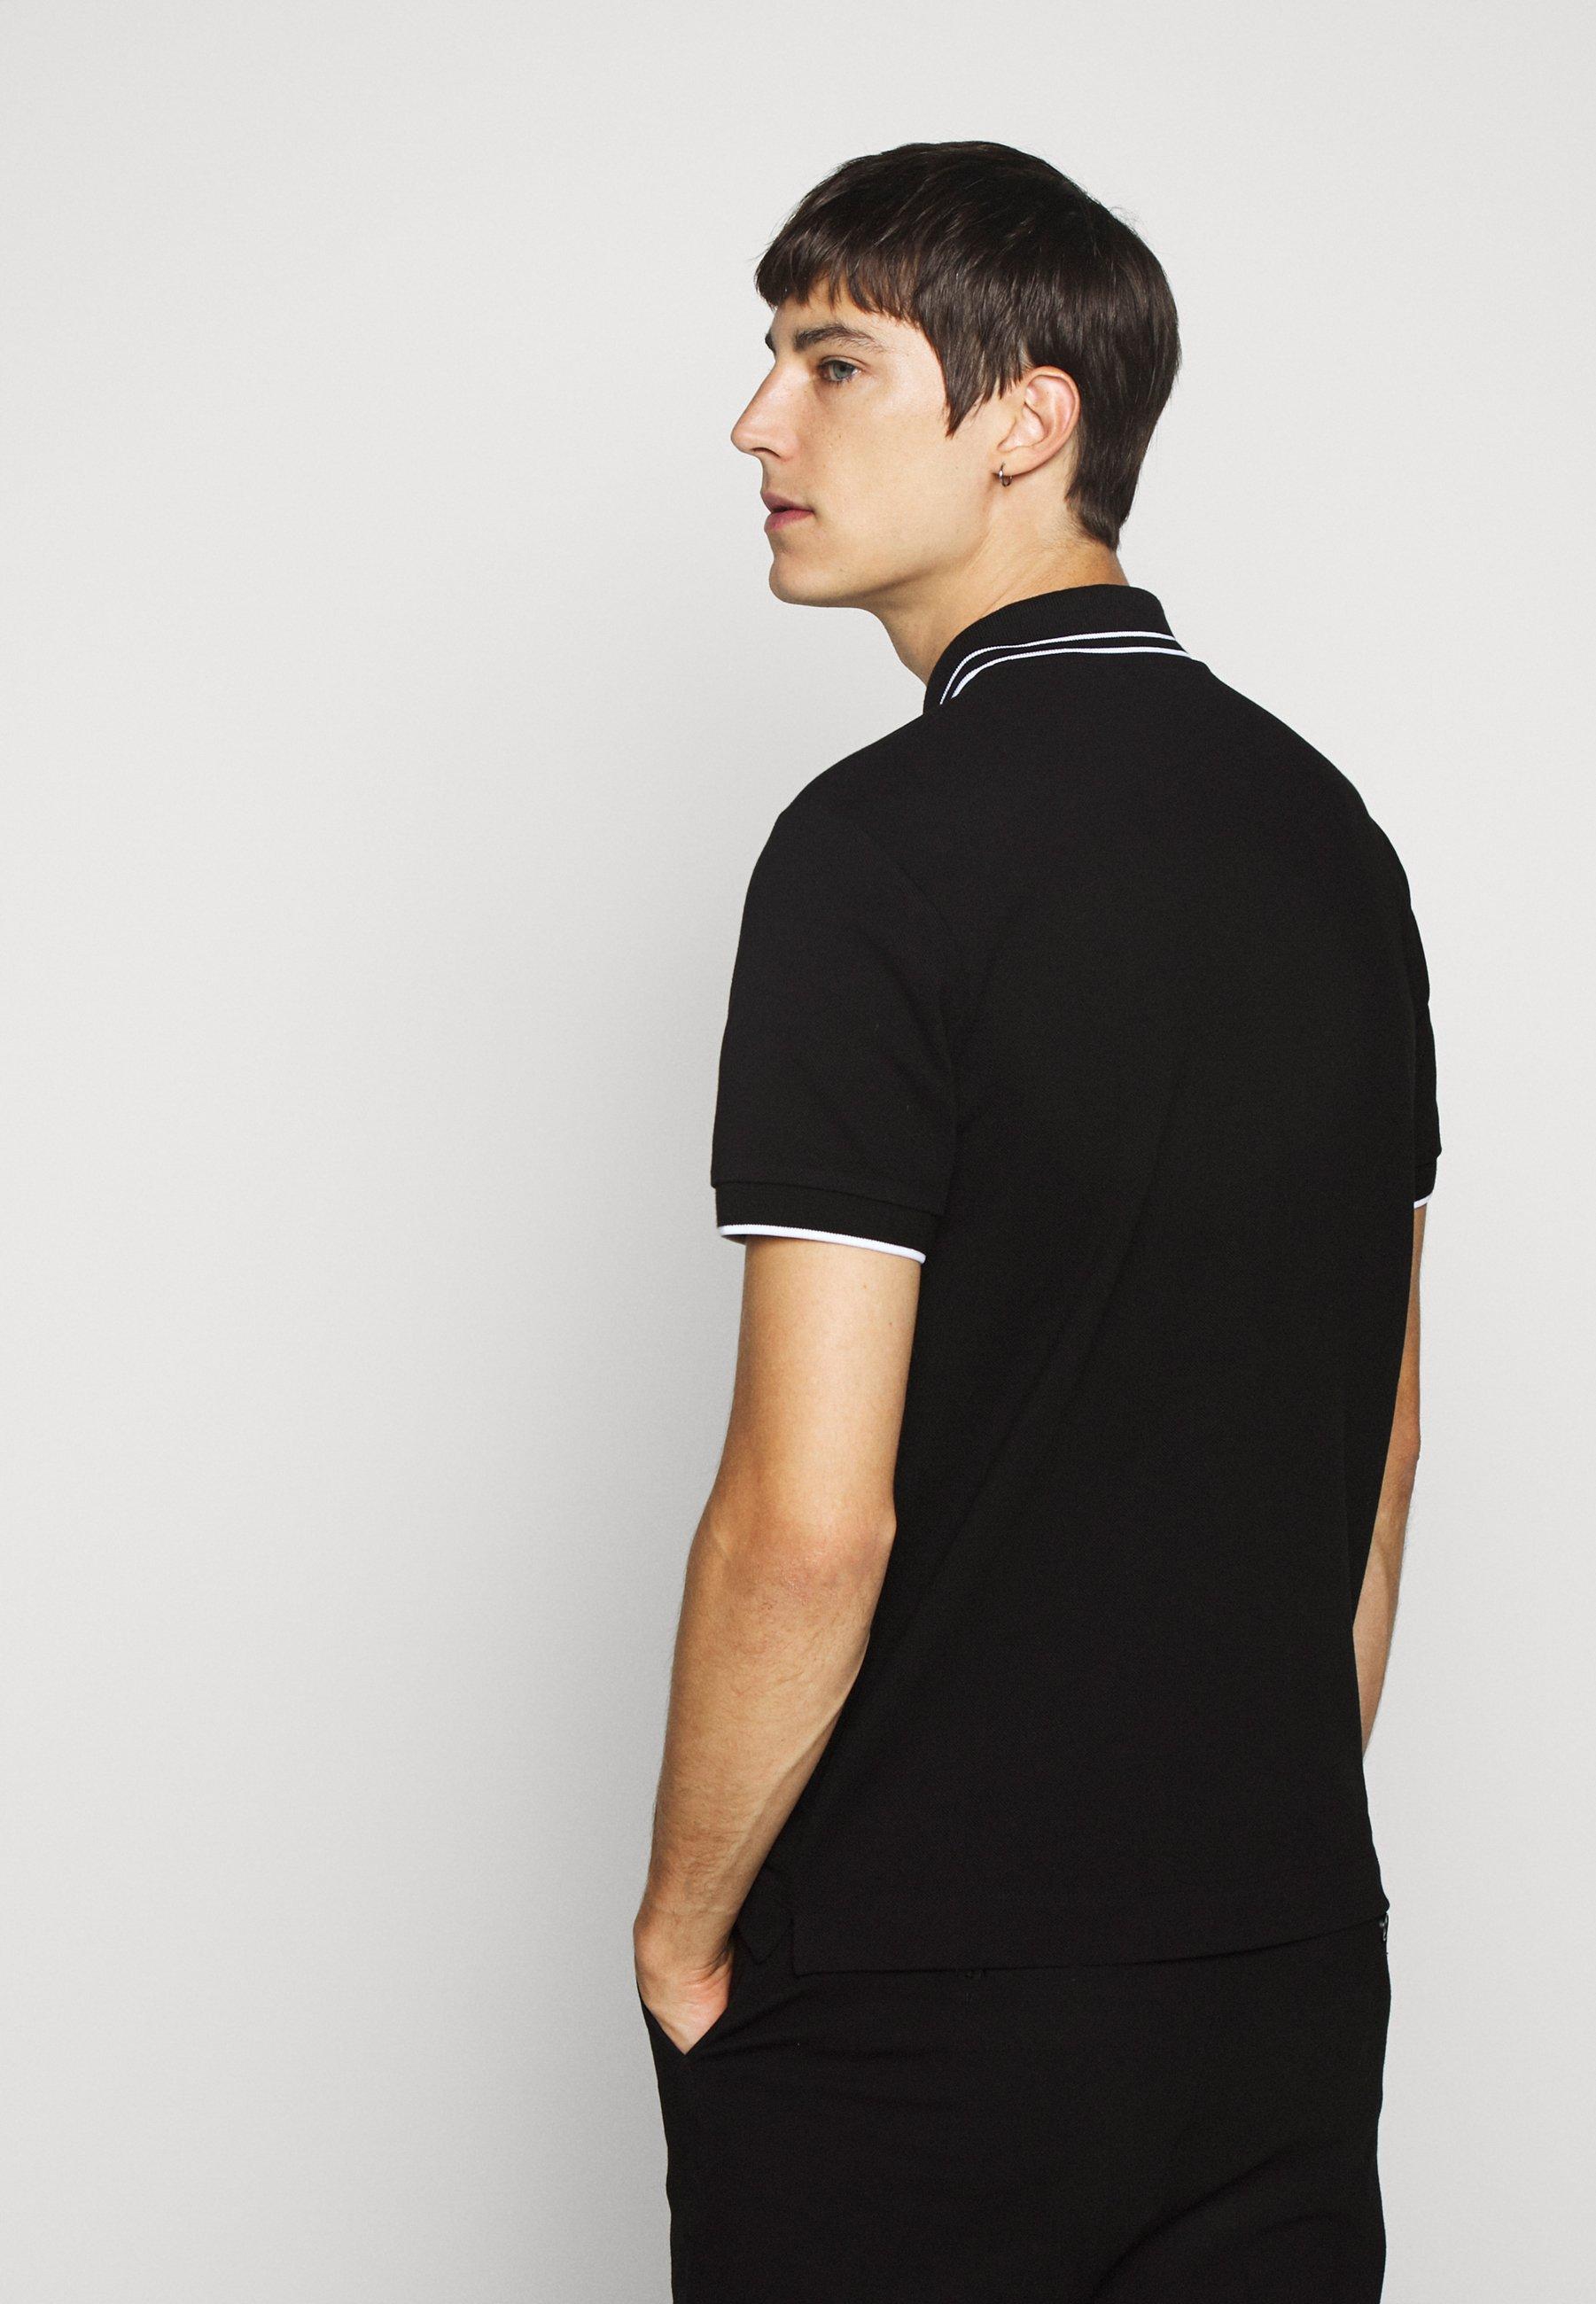 McQ Alexander McQueen Polo - darkest black/white